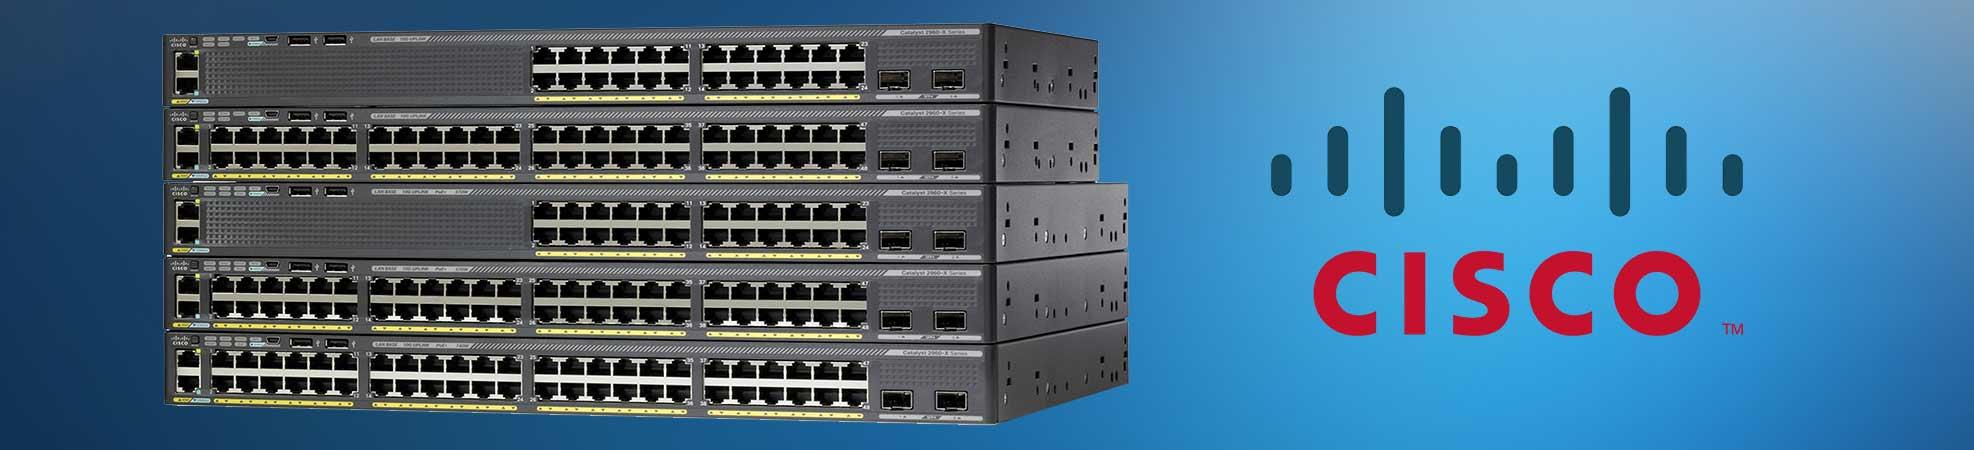 Cisco-switch-top-banner